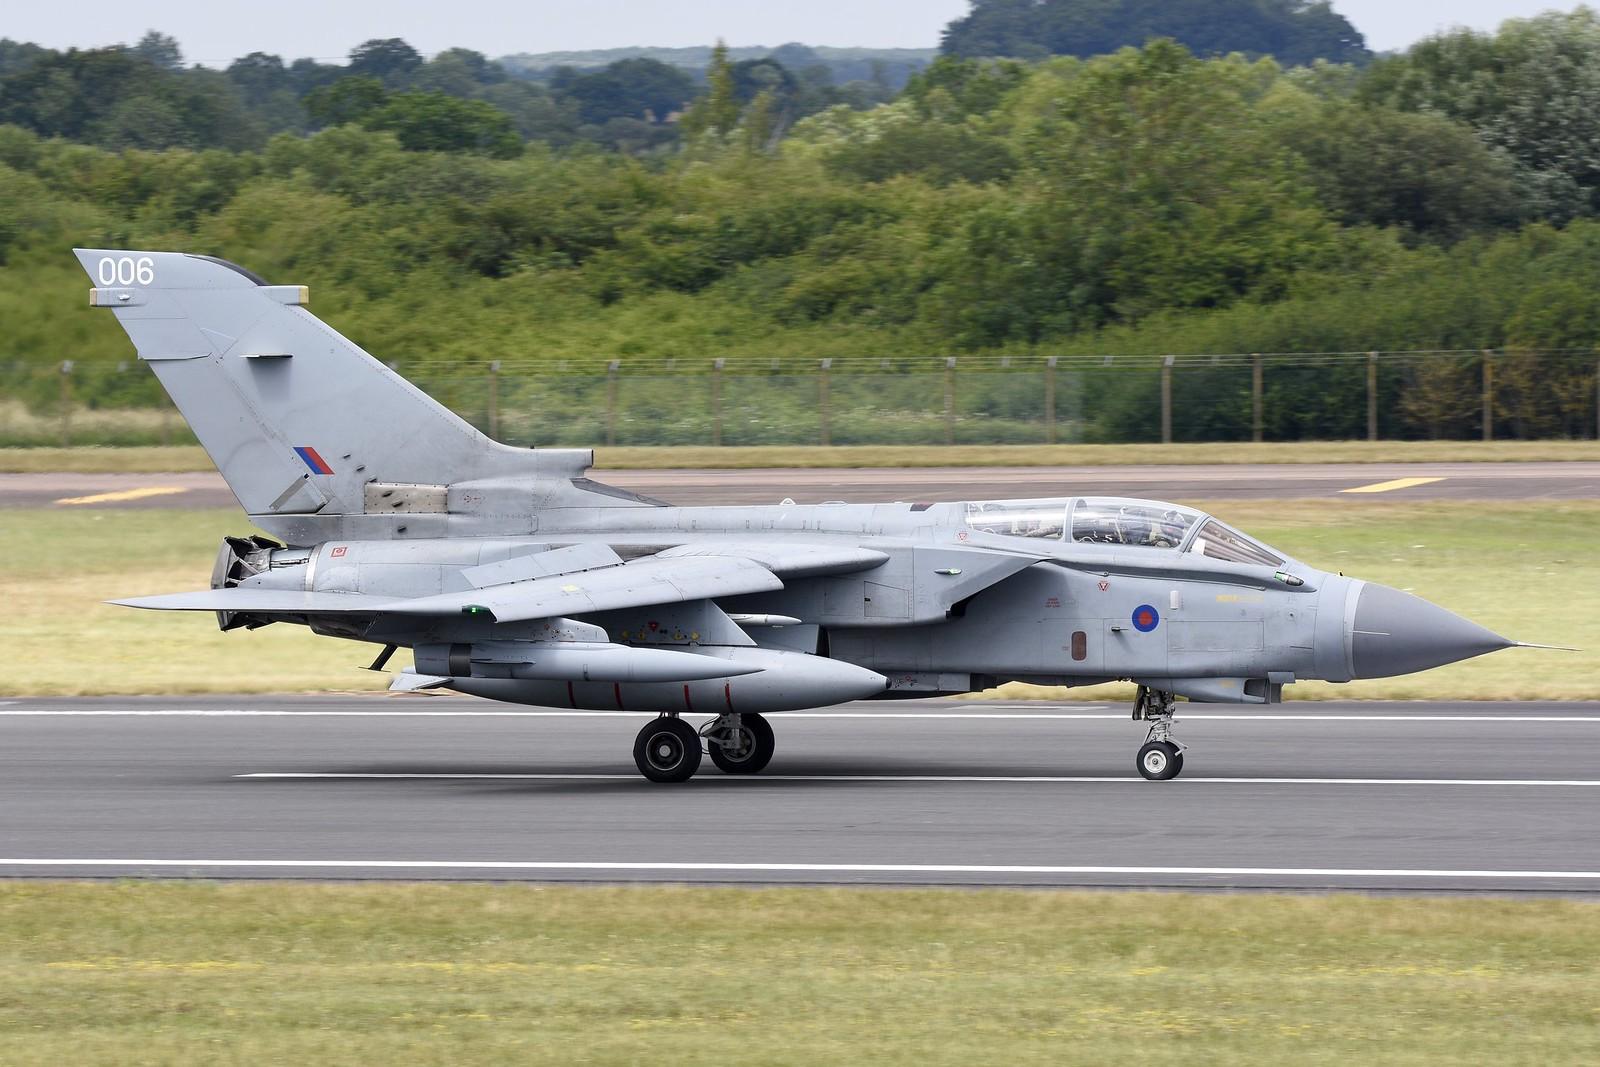 Panavia Tornado 19719657256_2dc4226d9c_h